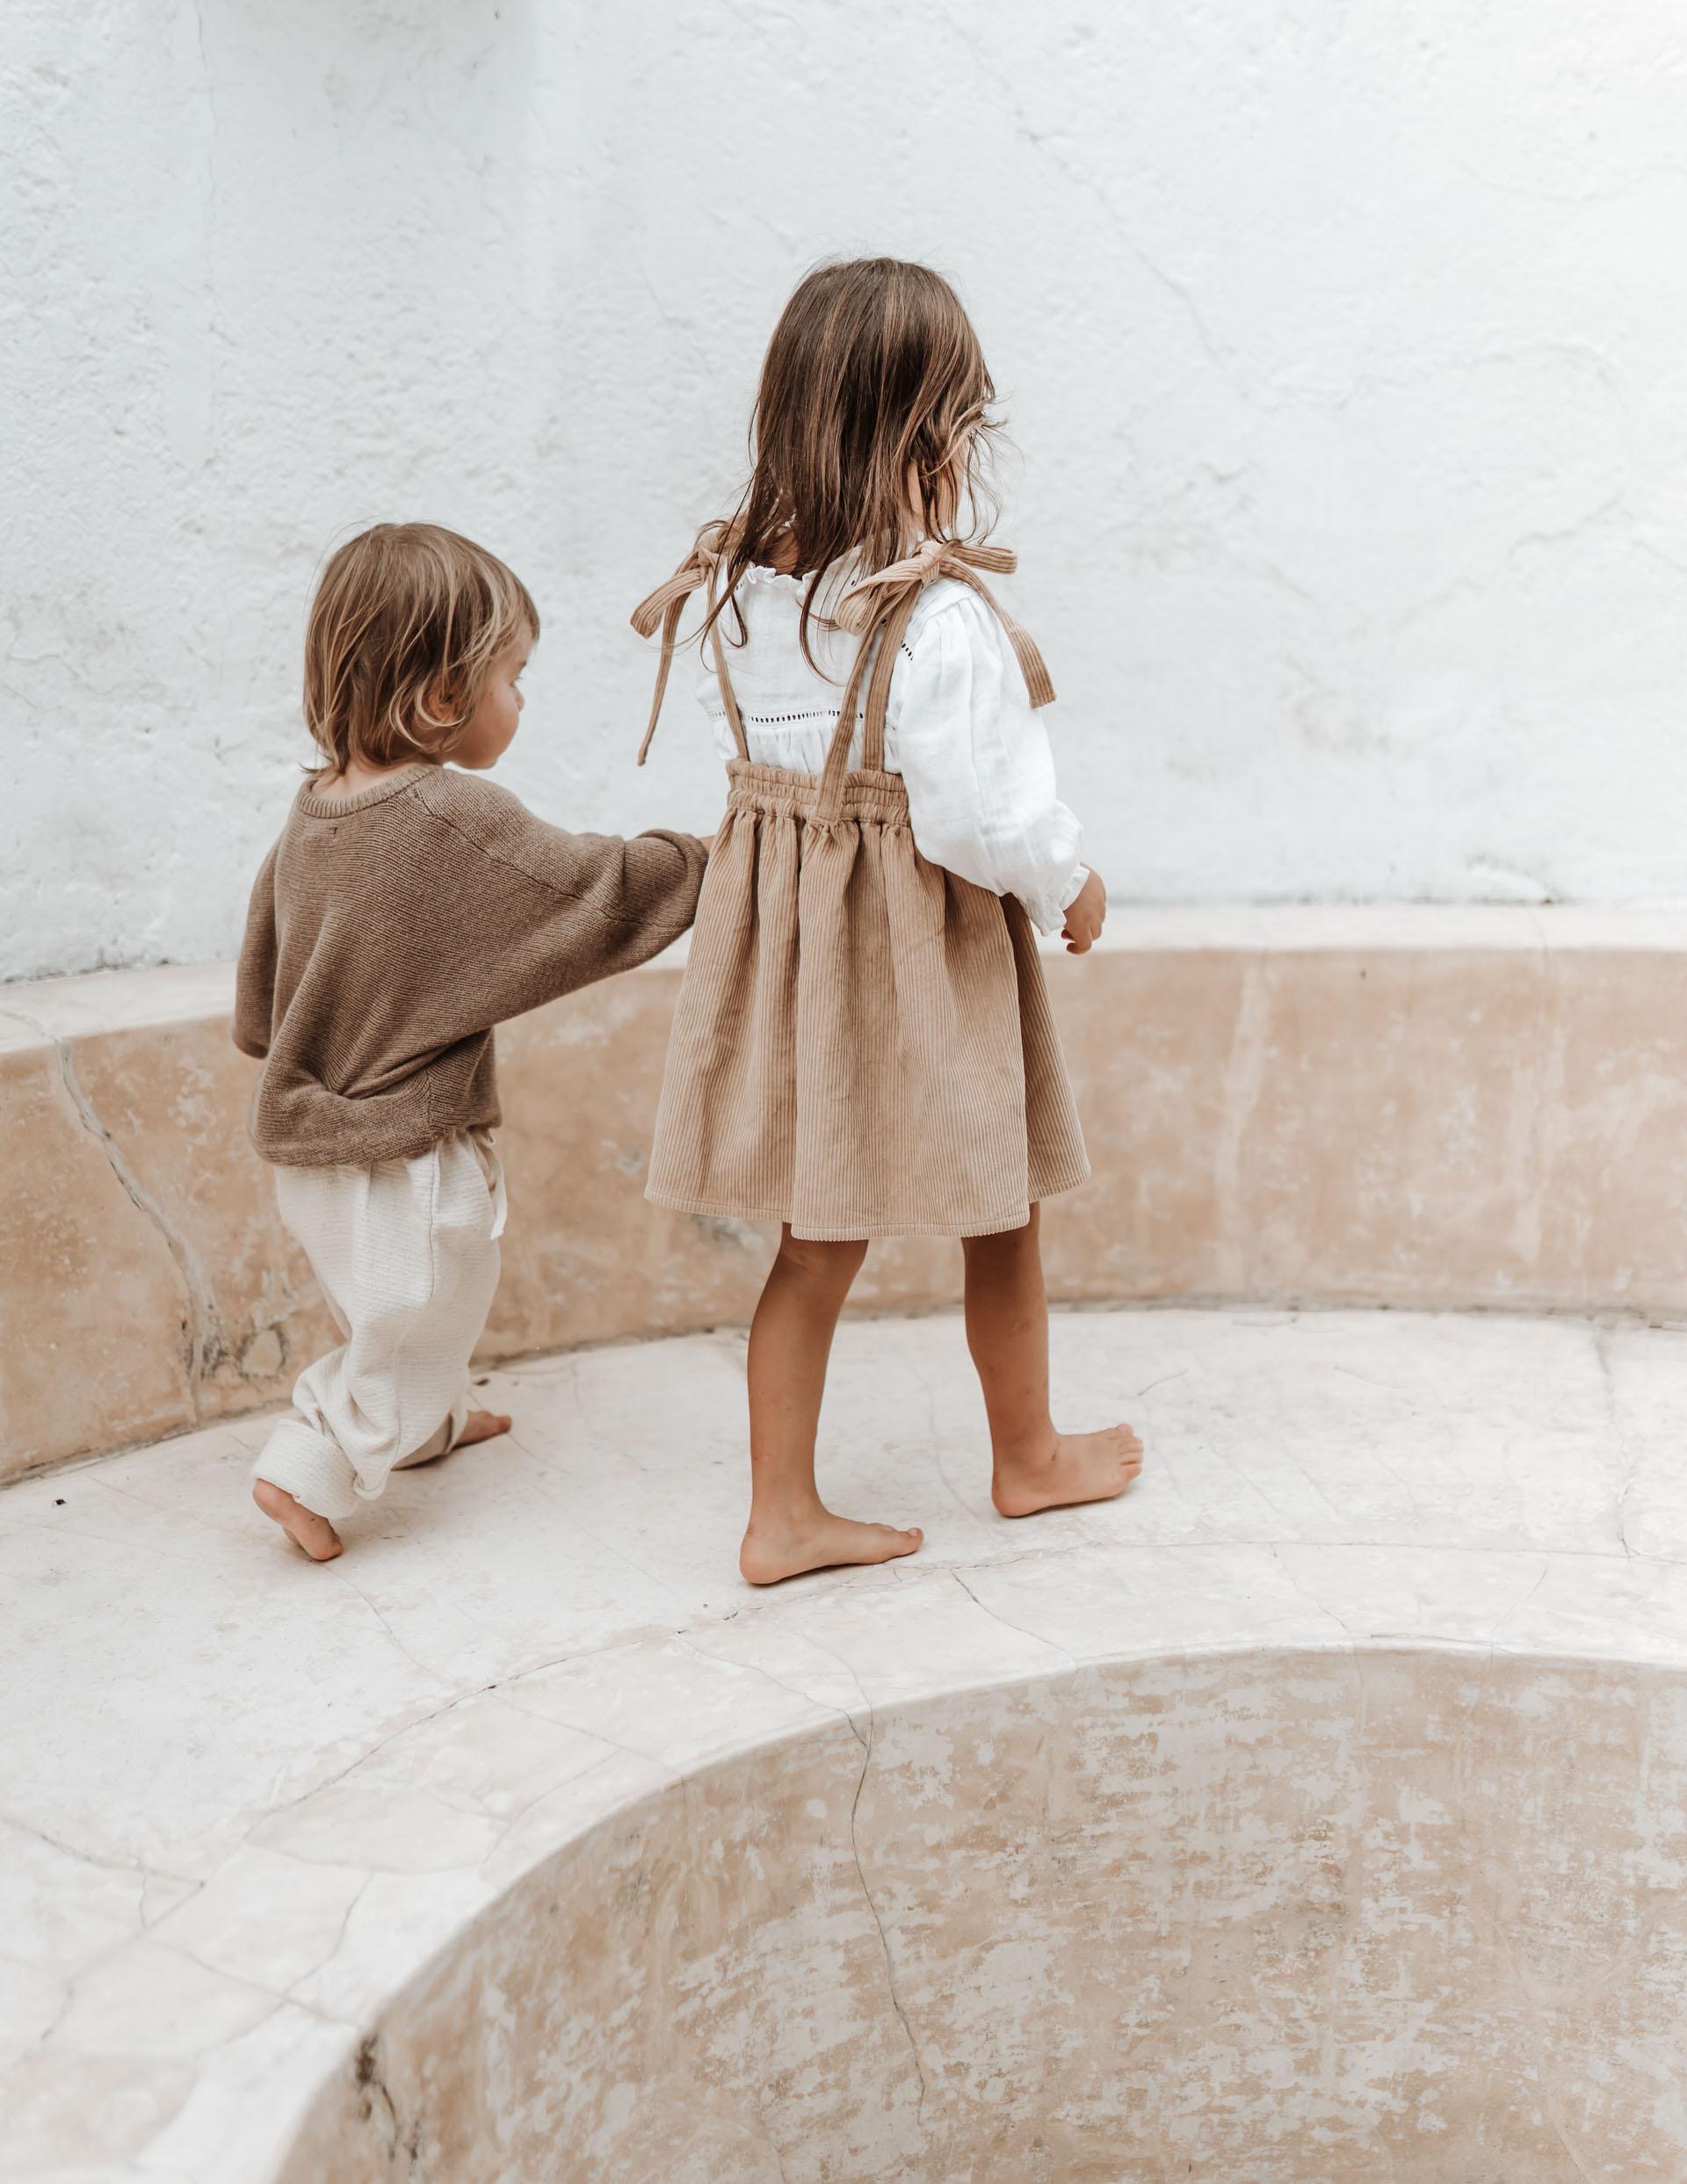 keira-mason-illoura-the-label-brother-and-sister-walking.jpg